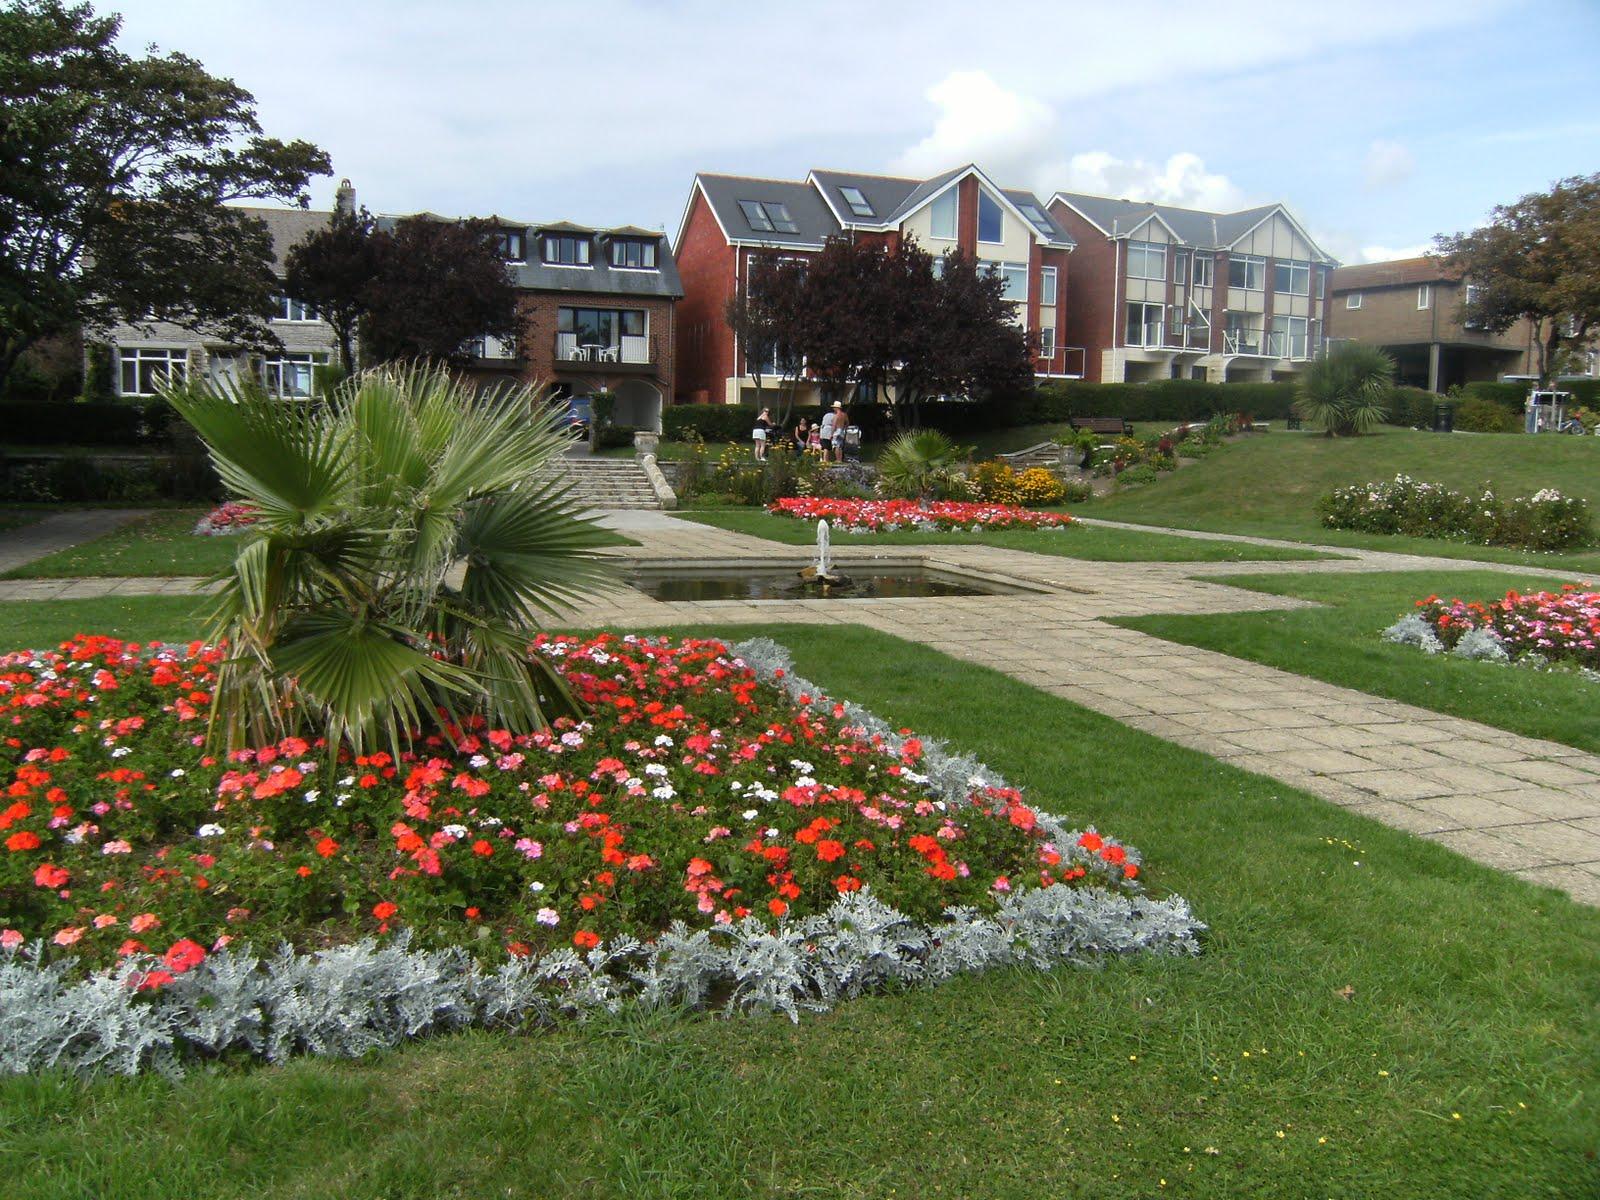 DSCF1662 Gardens at Sandsfoot